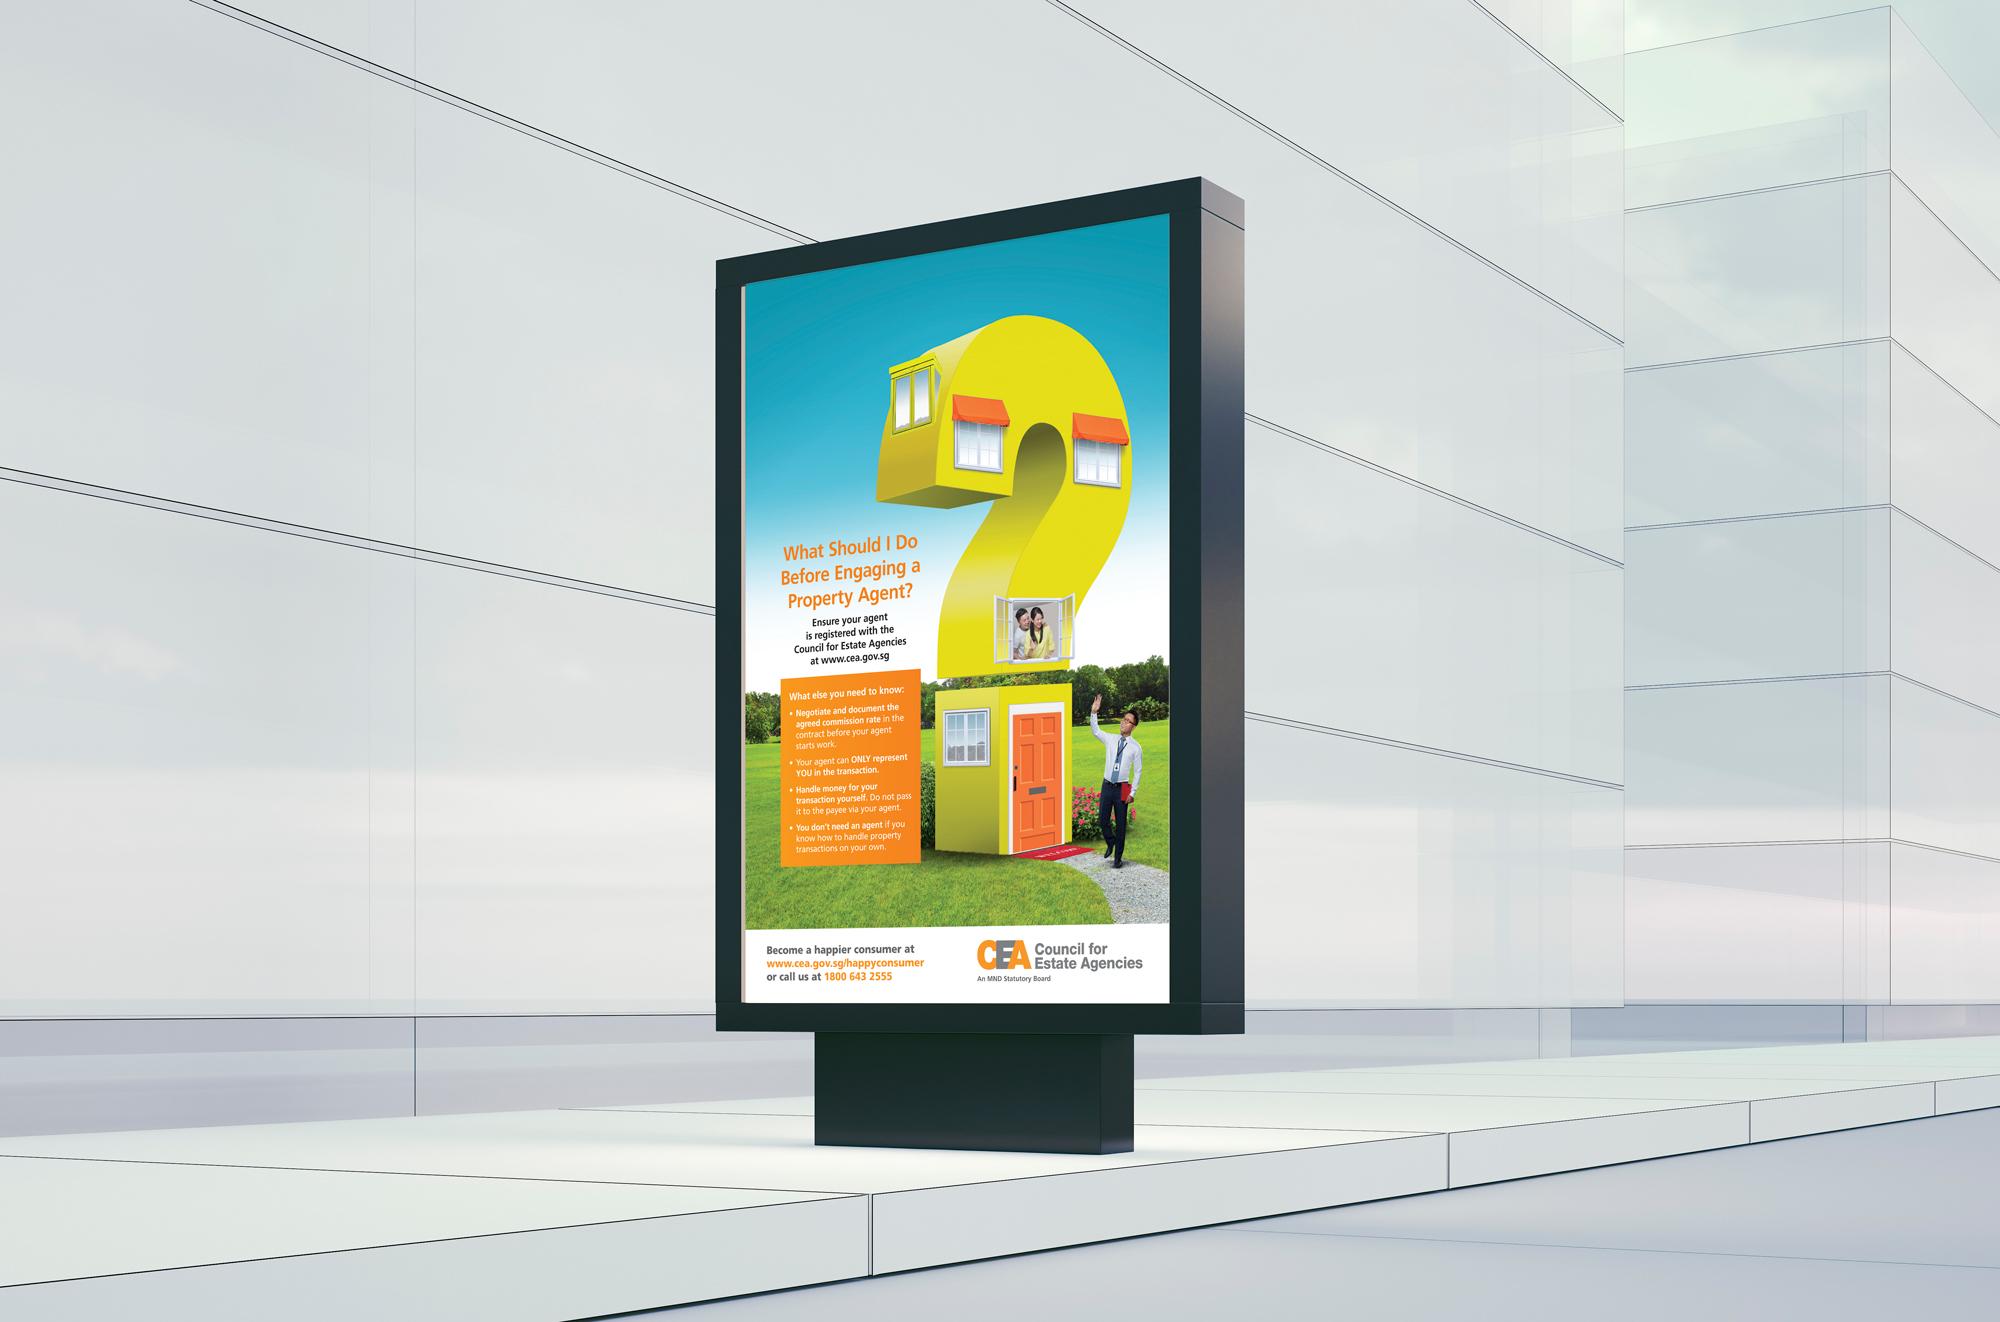 Xodbox council for estate agencies be a happier consumerd dont be like mdm tan hor solutioingenieria Choice Image